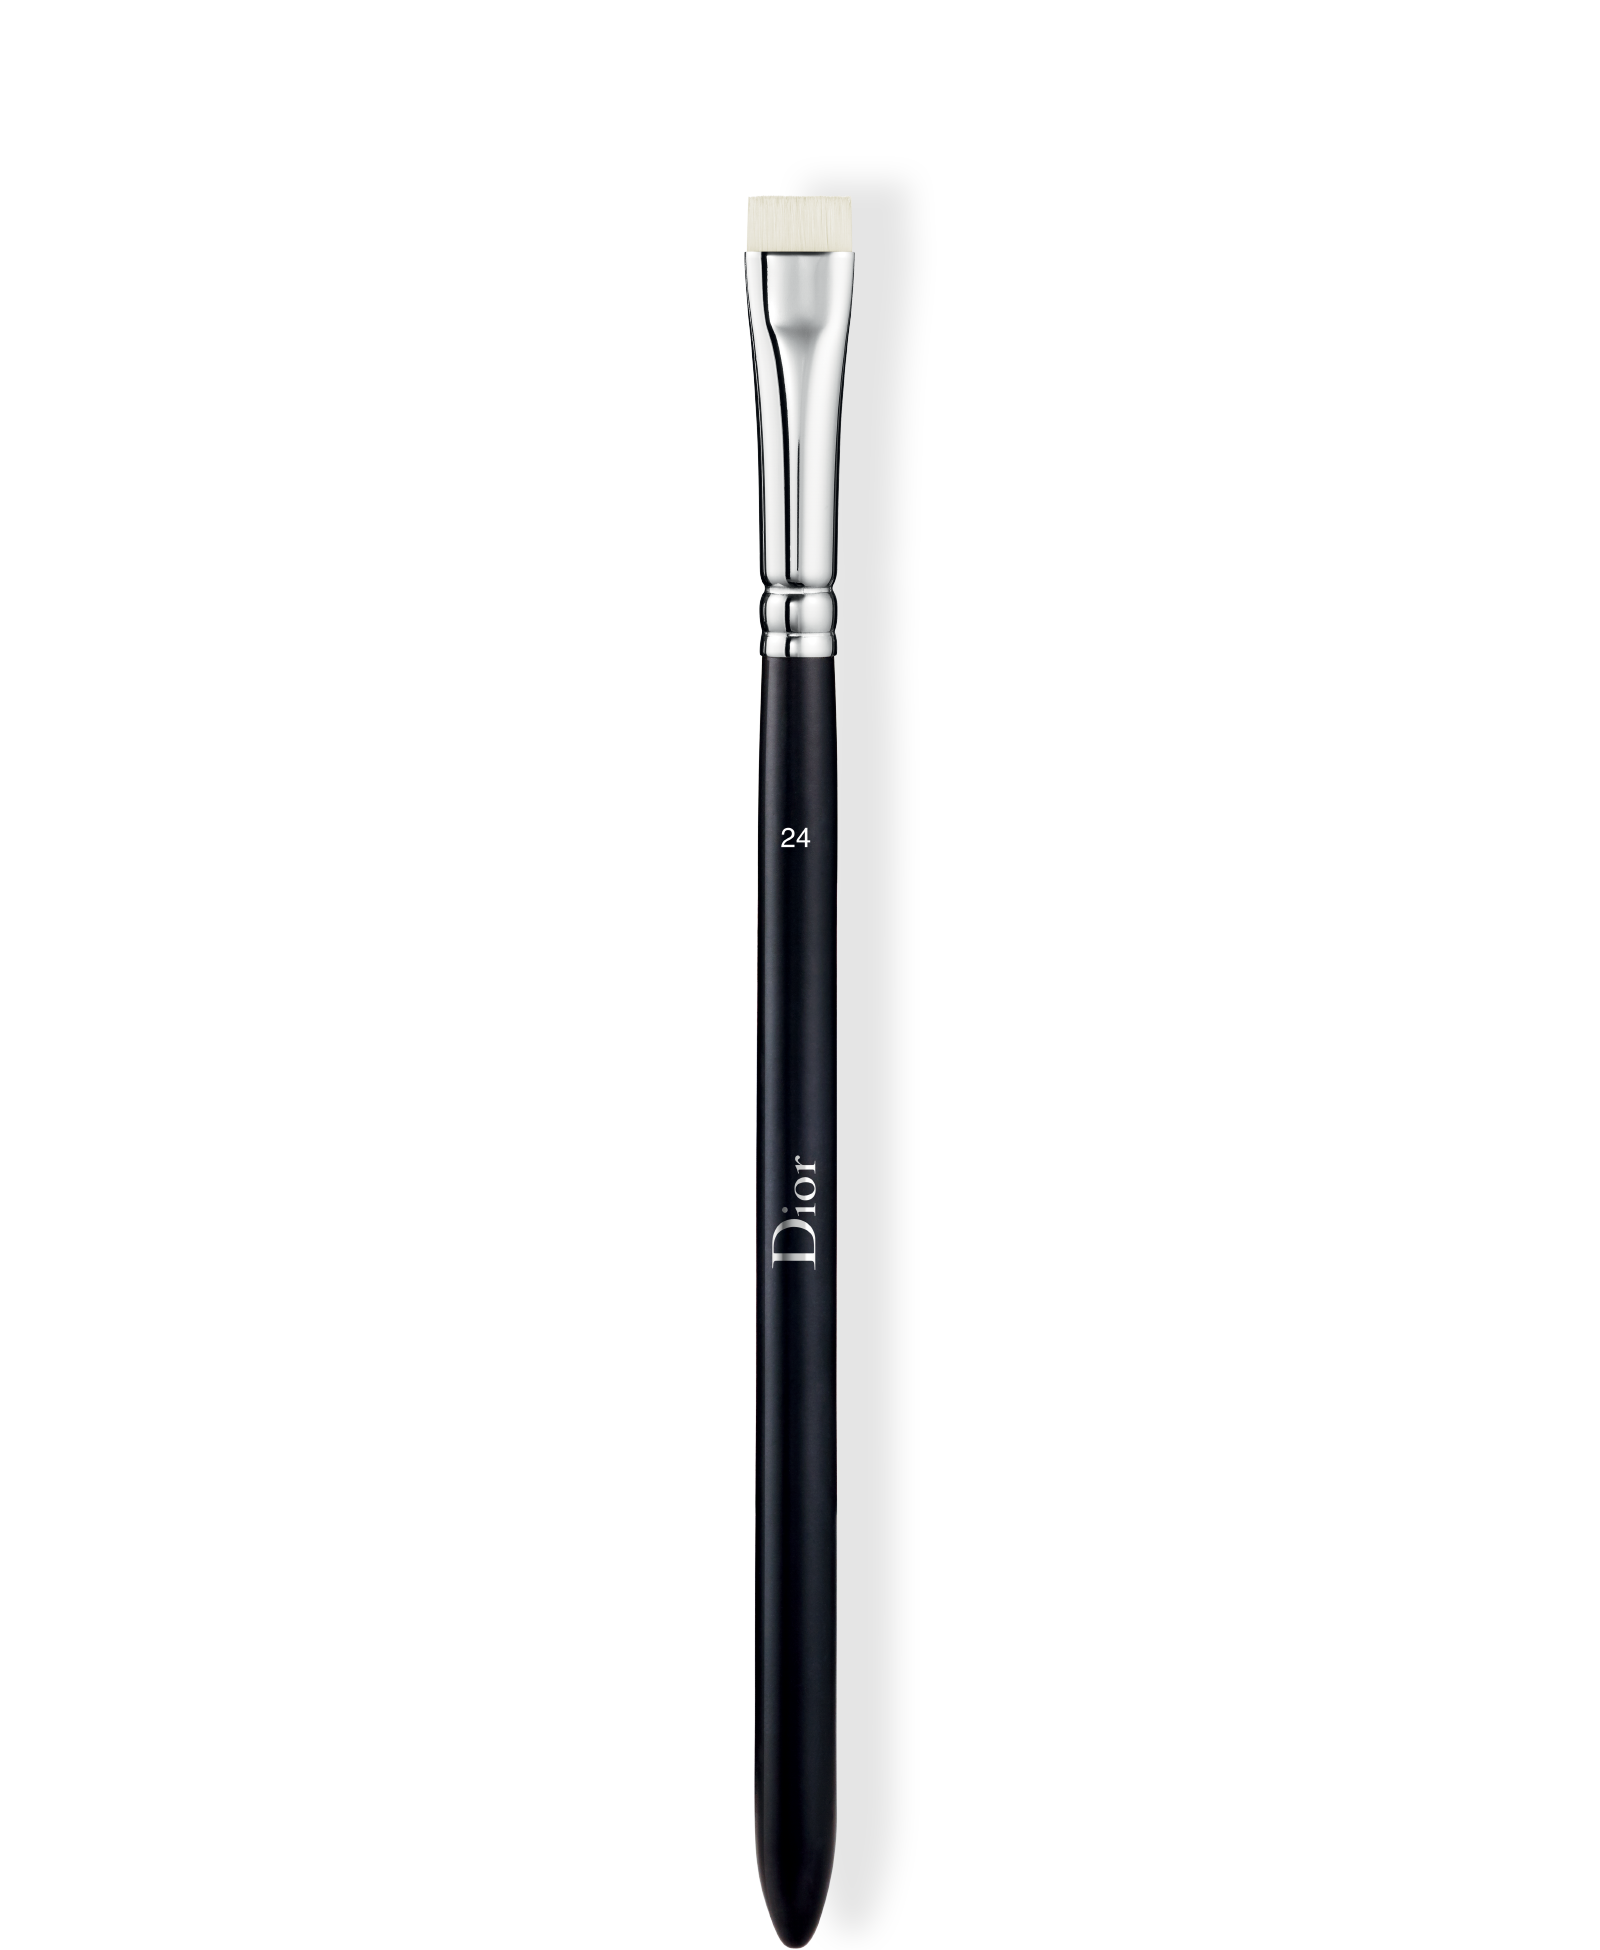 DIOR Eyeliner Brush, N° 24